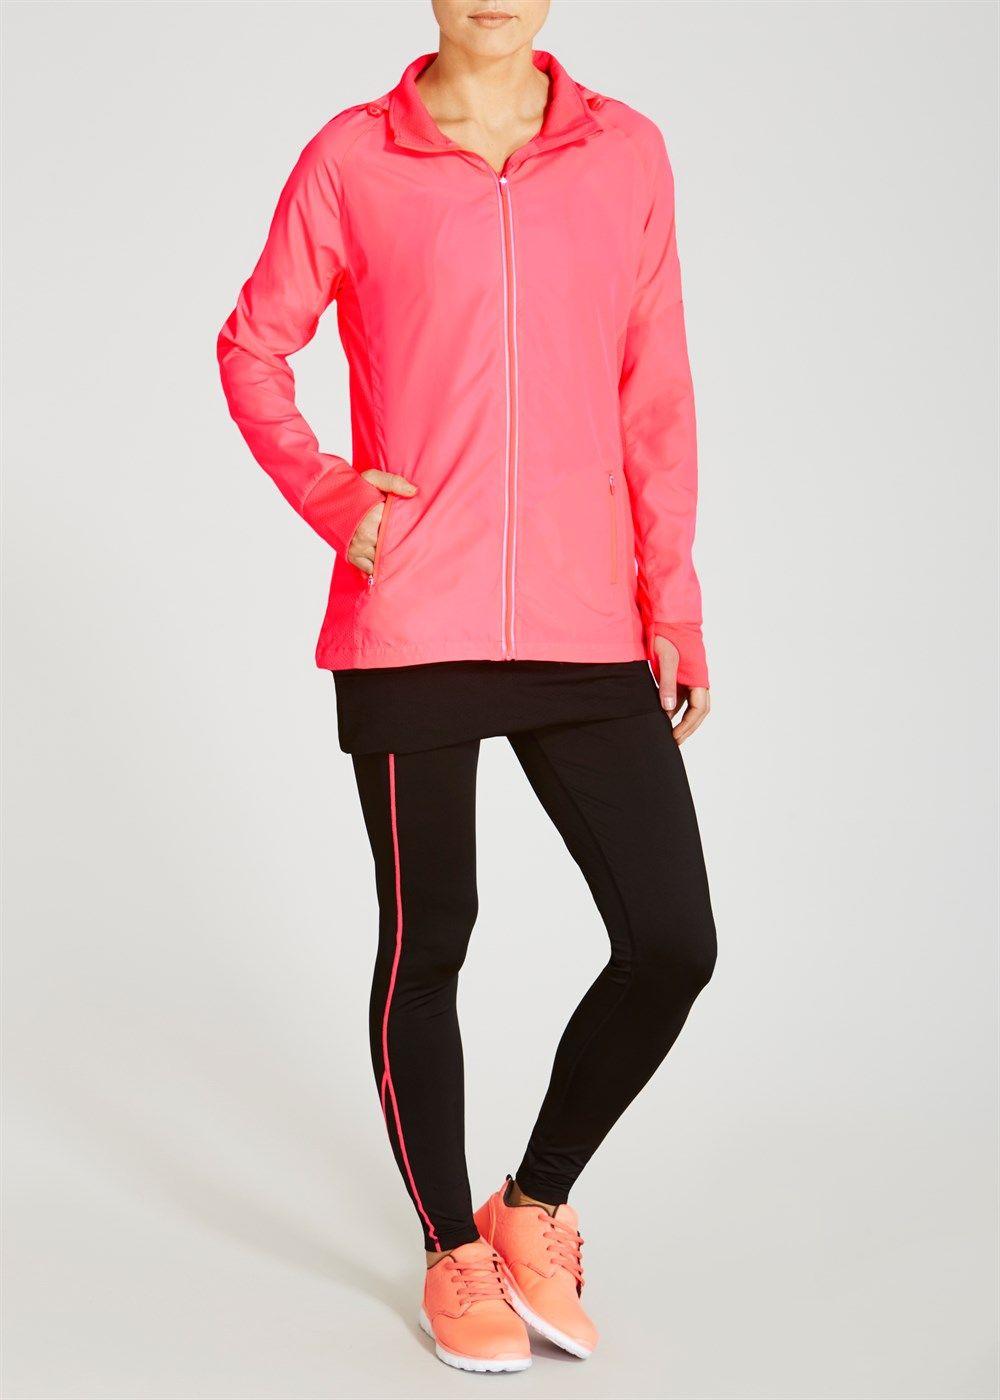 b93c0aea7 Activewear Lightweight Jacket - Matalan   New Year's Resolutions at ...